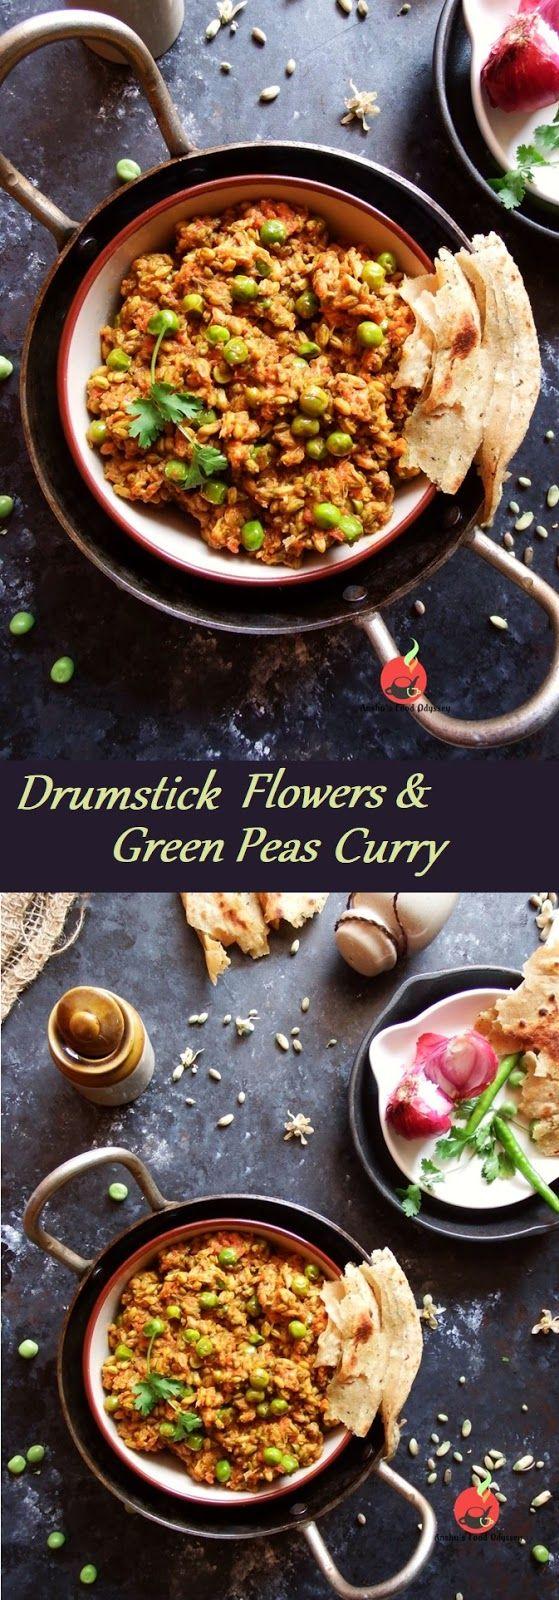 Swanjane Aur Matar Ki Sabzi Drumstick Flowers Green Peas Curry Recipes Food Indian Food Recipes